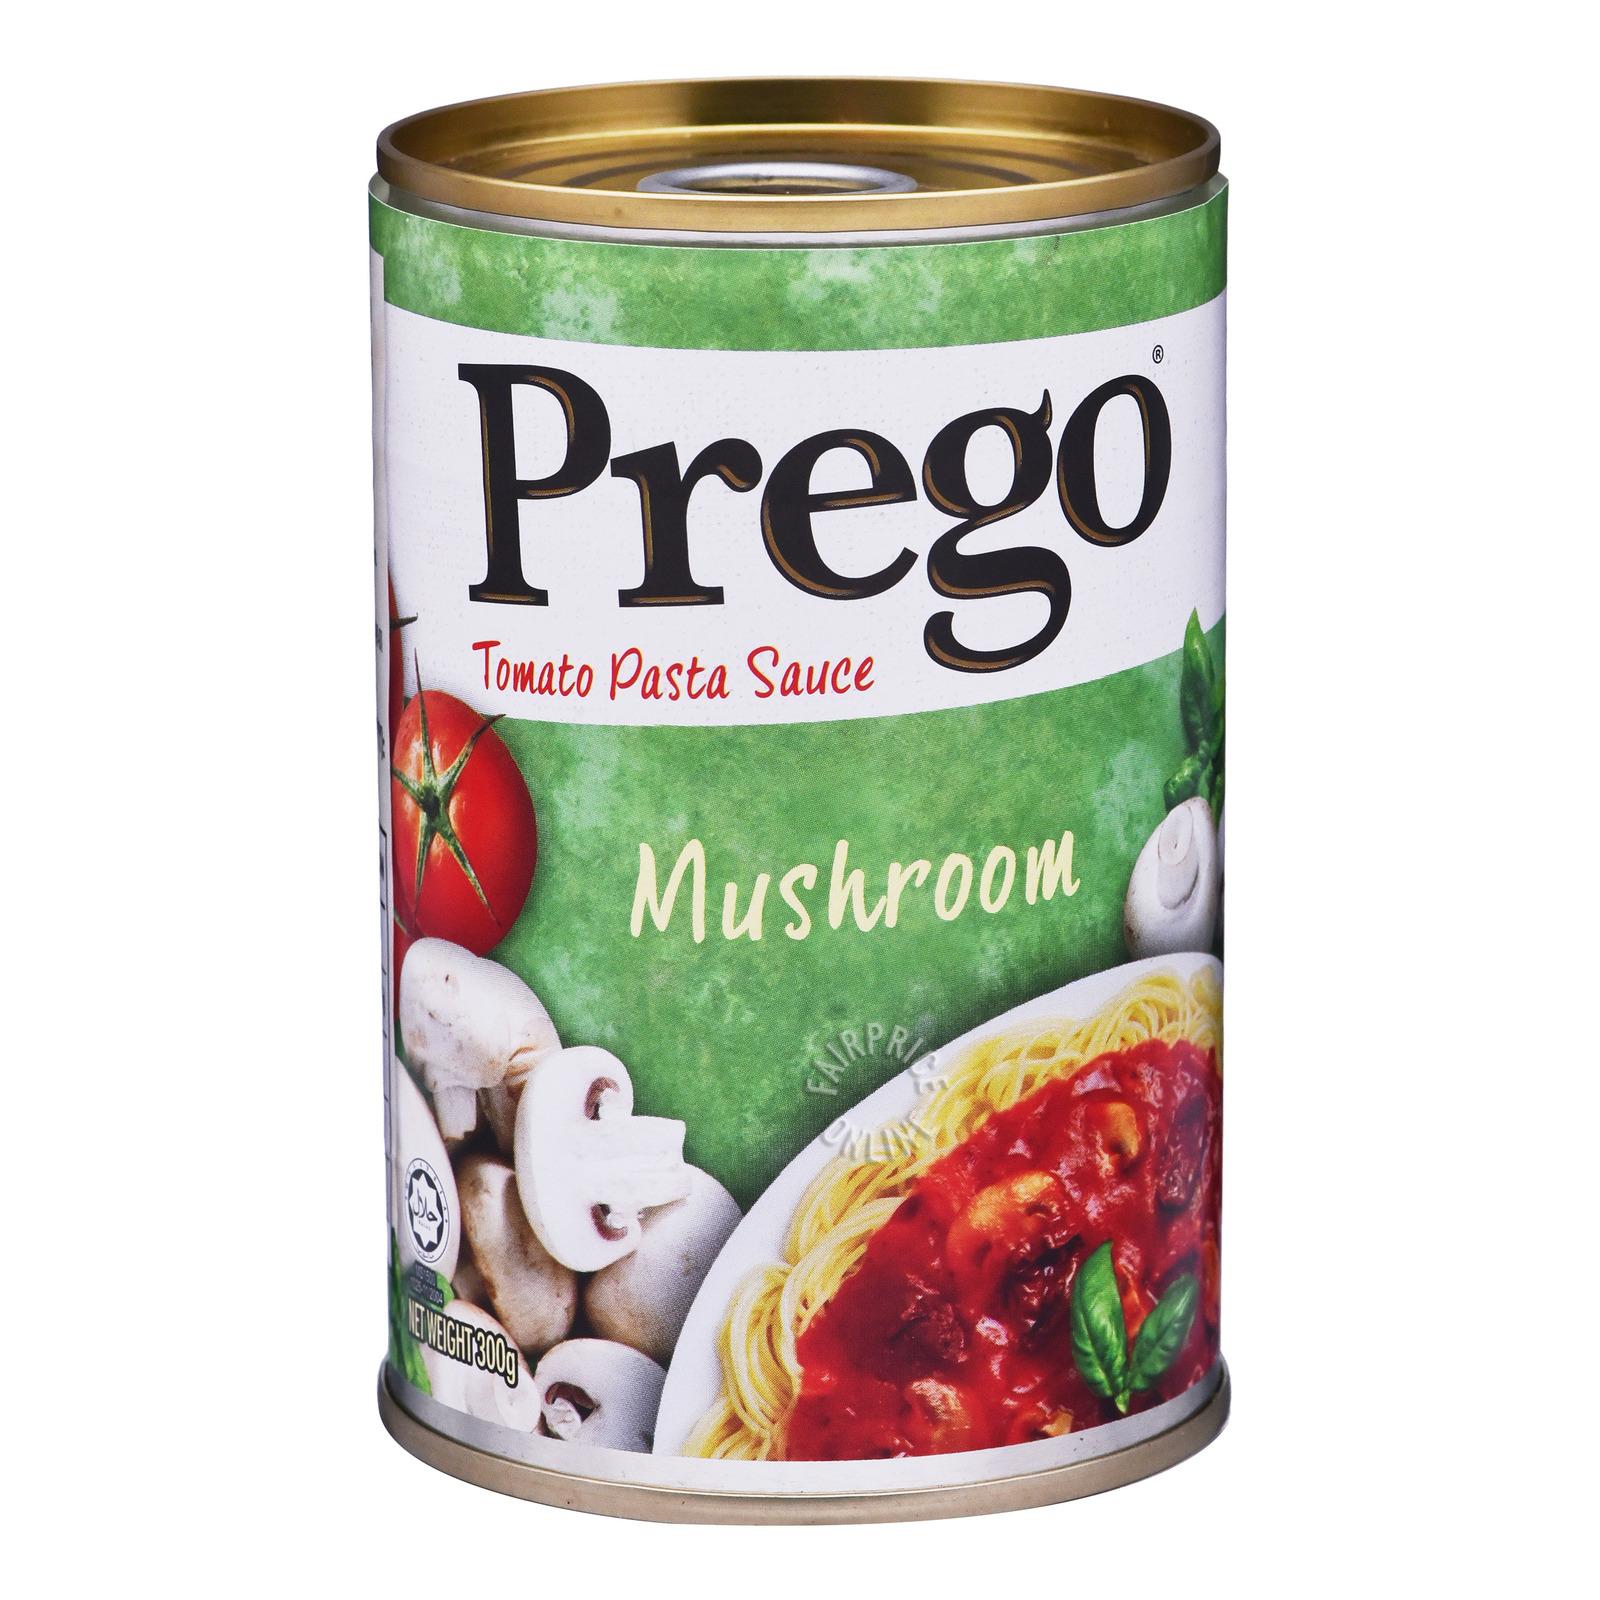 PREGO Pasta Sauce - Mushroom 300g